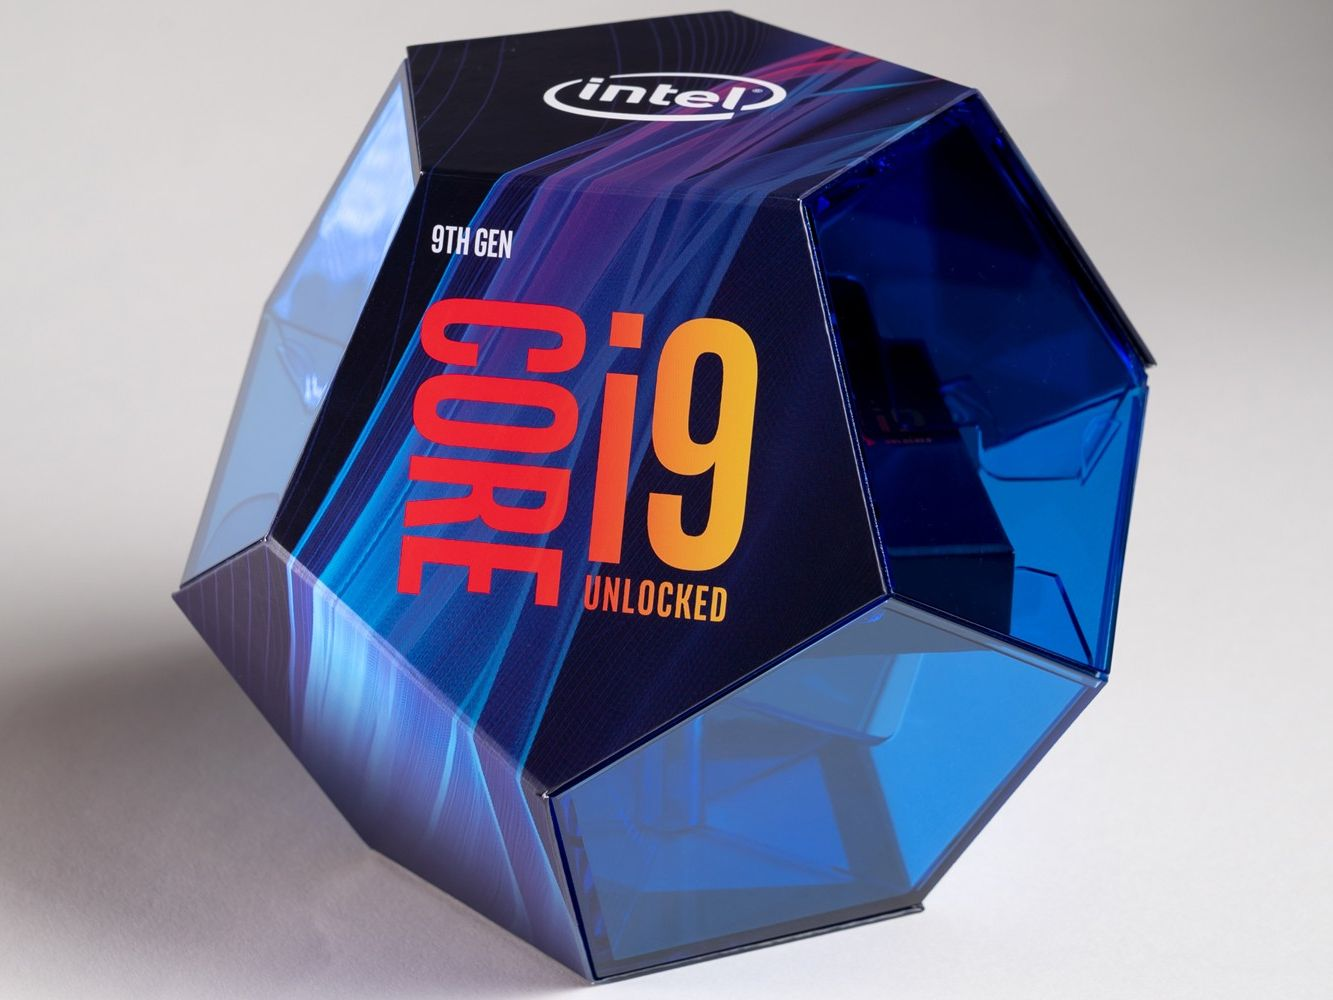 intel core i9 9900k unter 500 euro und kommt ein i9 9900kf. Black Bedroom Furniture Sets. Home Design Ideas